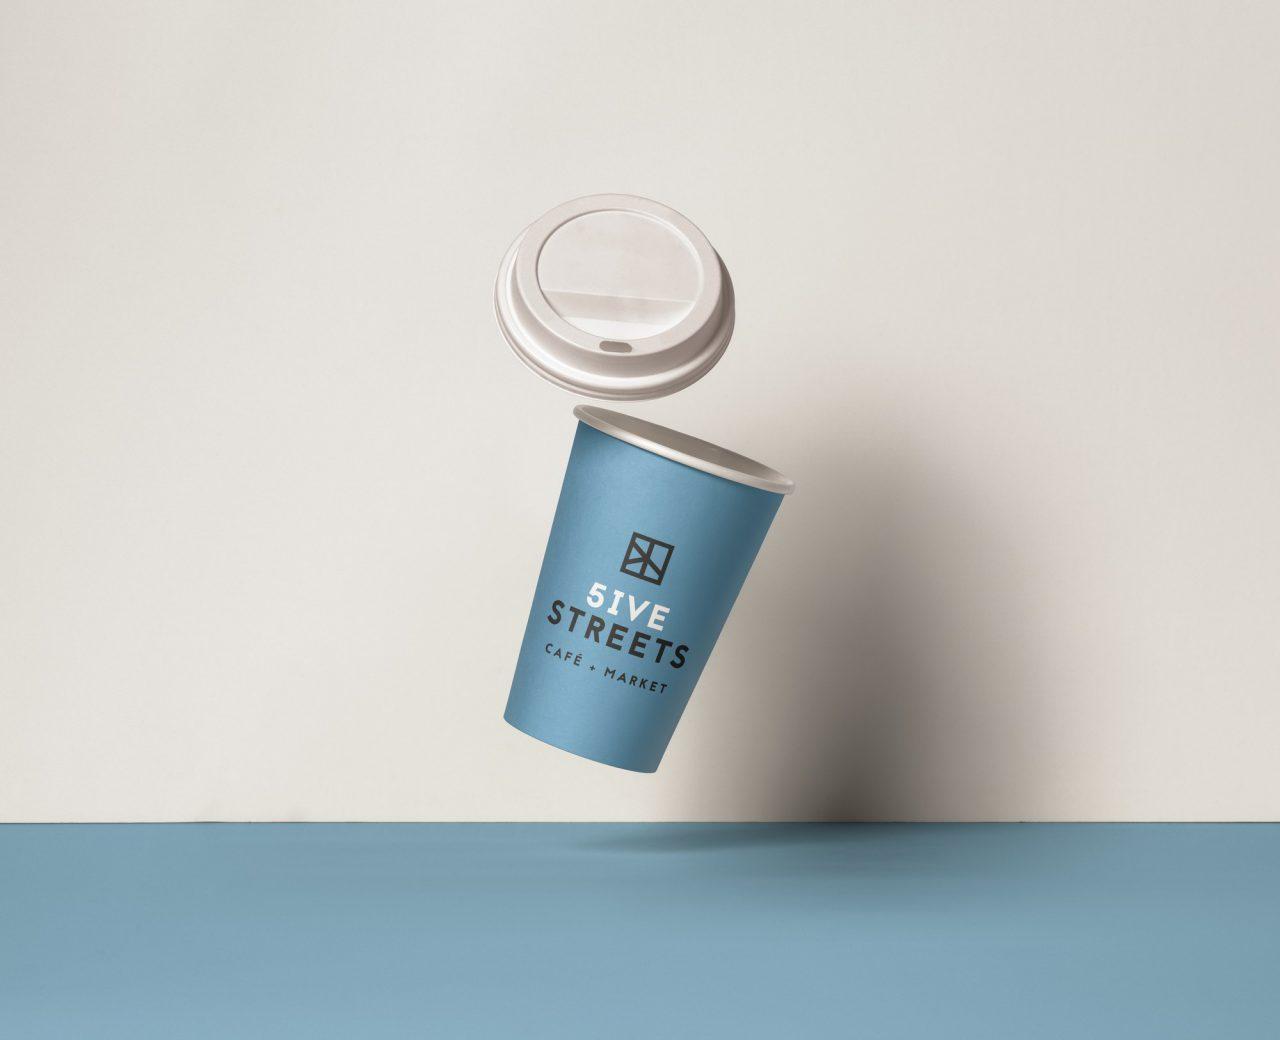 Five Streets Cafe - Branding